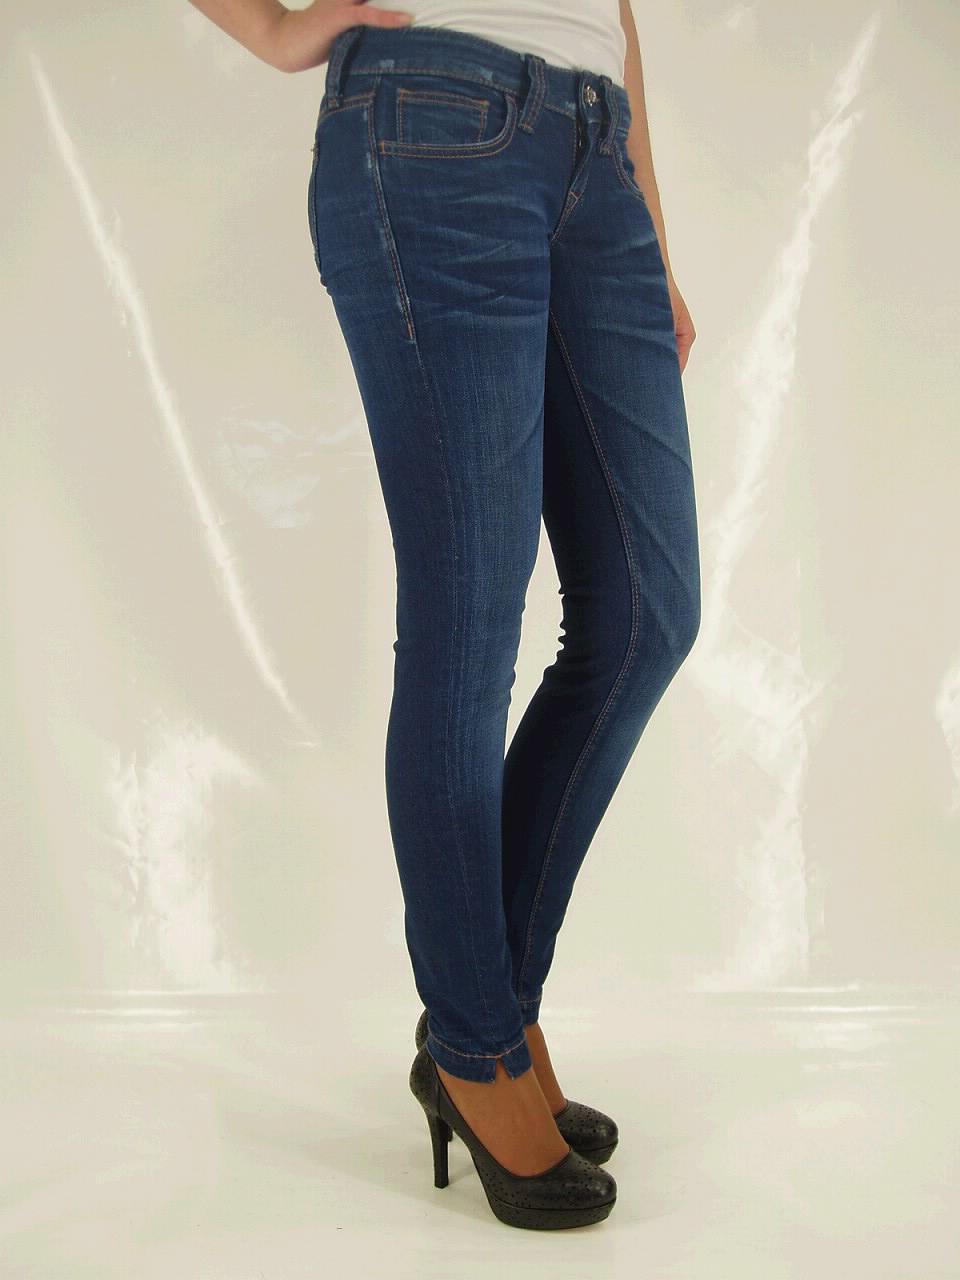 Jeans Fornarina - 492 PIN UP SKINNY ECO